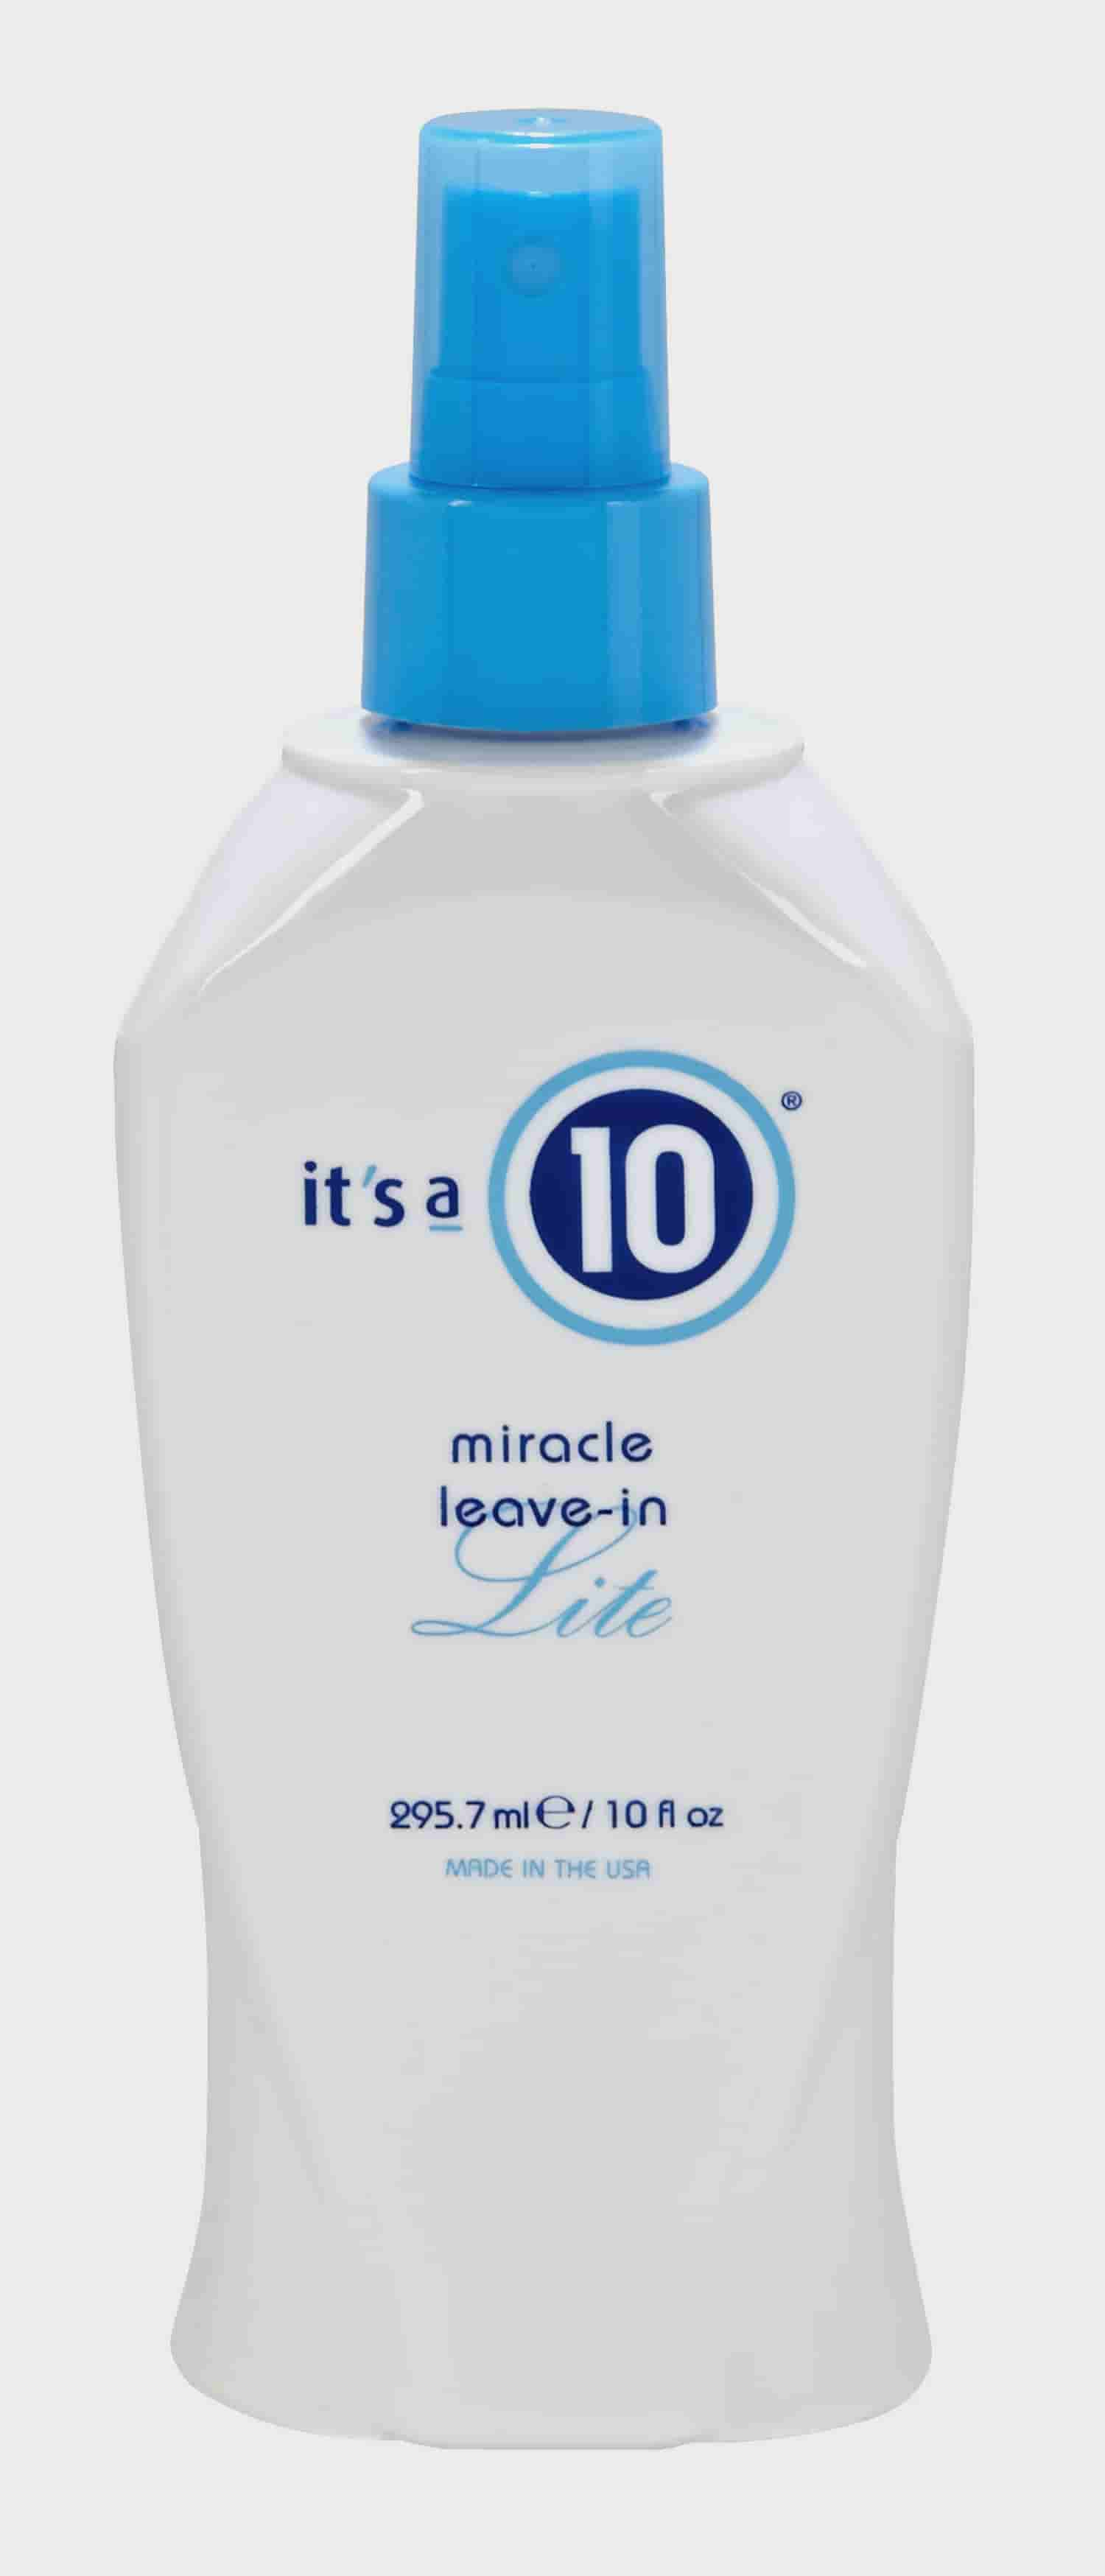 ($37.99 Value) It's a 10 Miracle Leave-in Lite Detangler, 10 fl oz